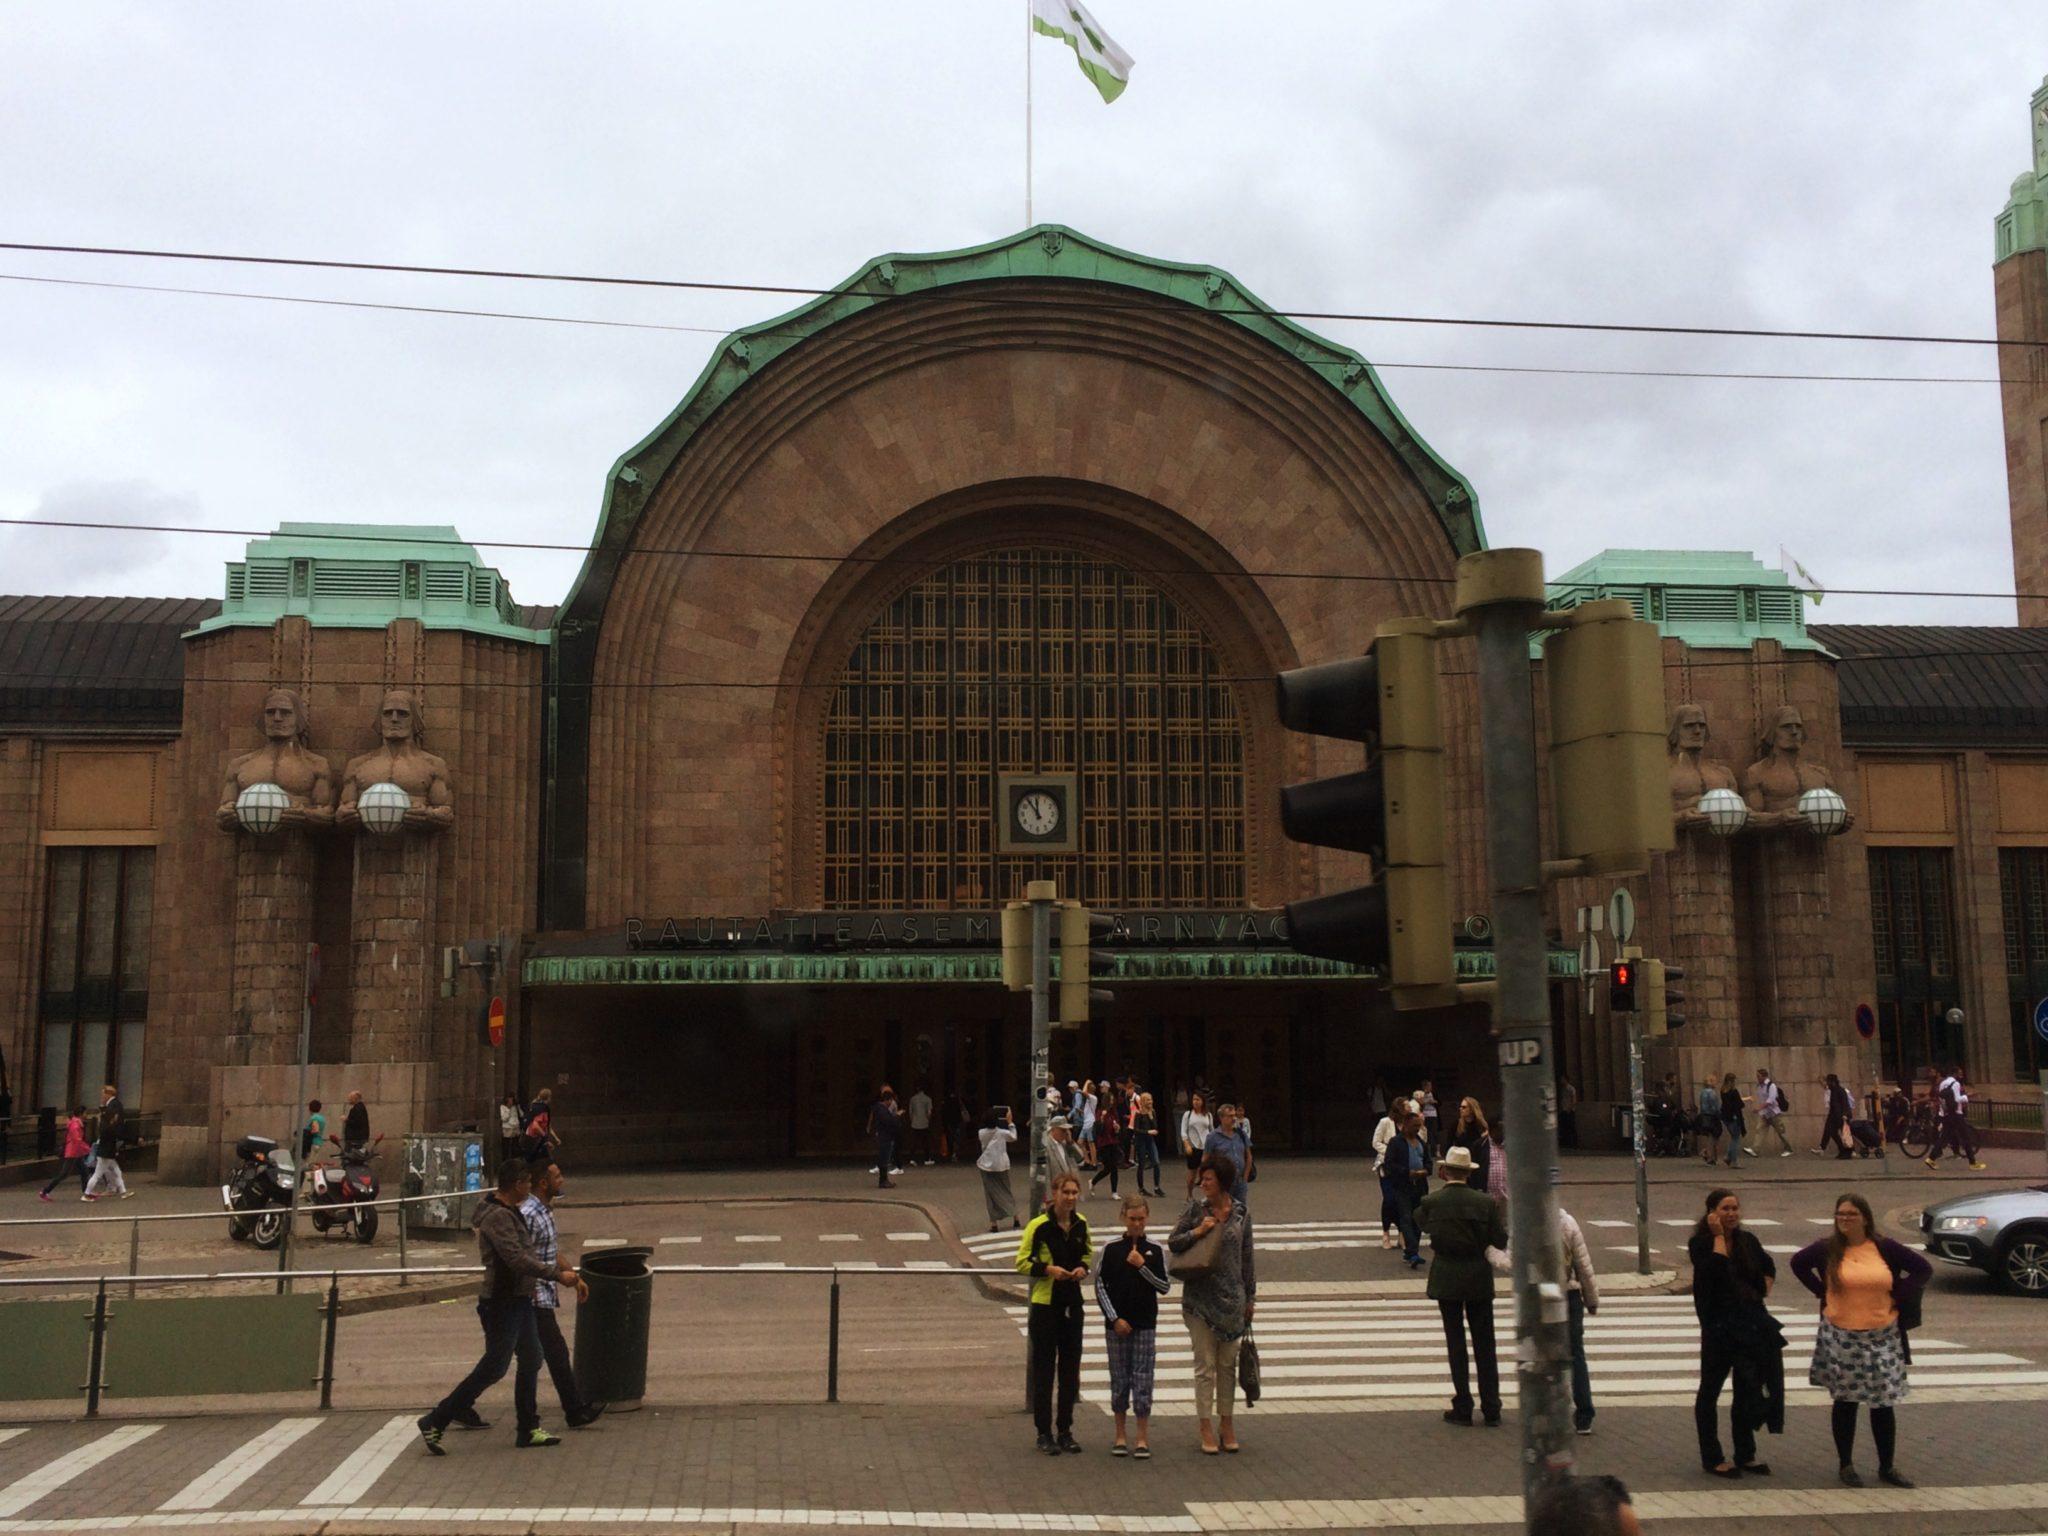 Helsinki Central Railway